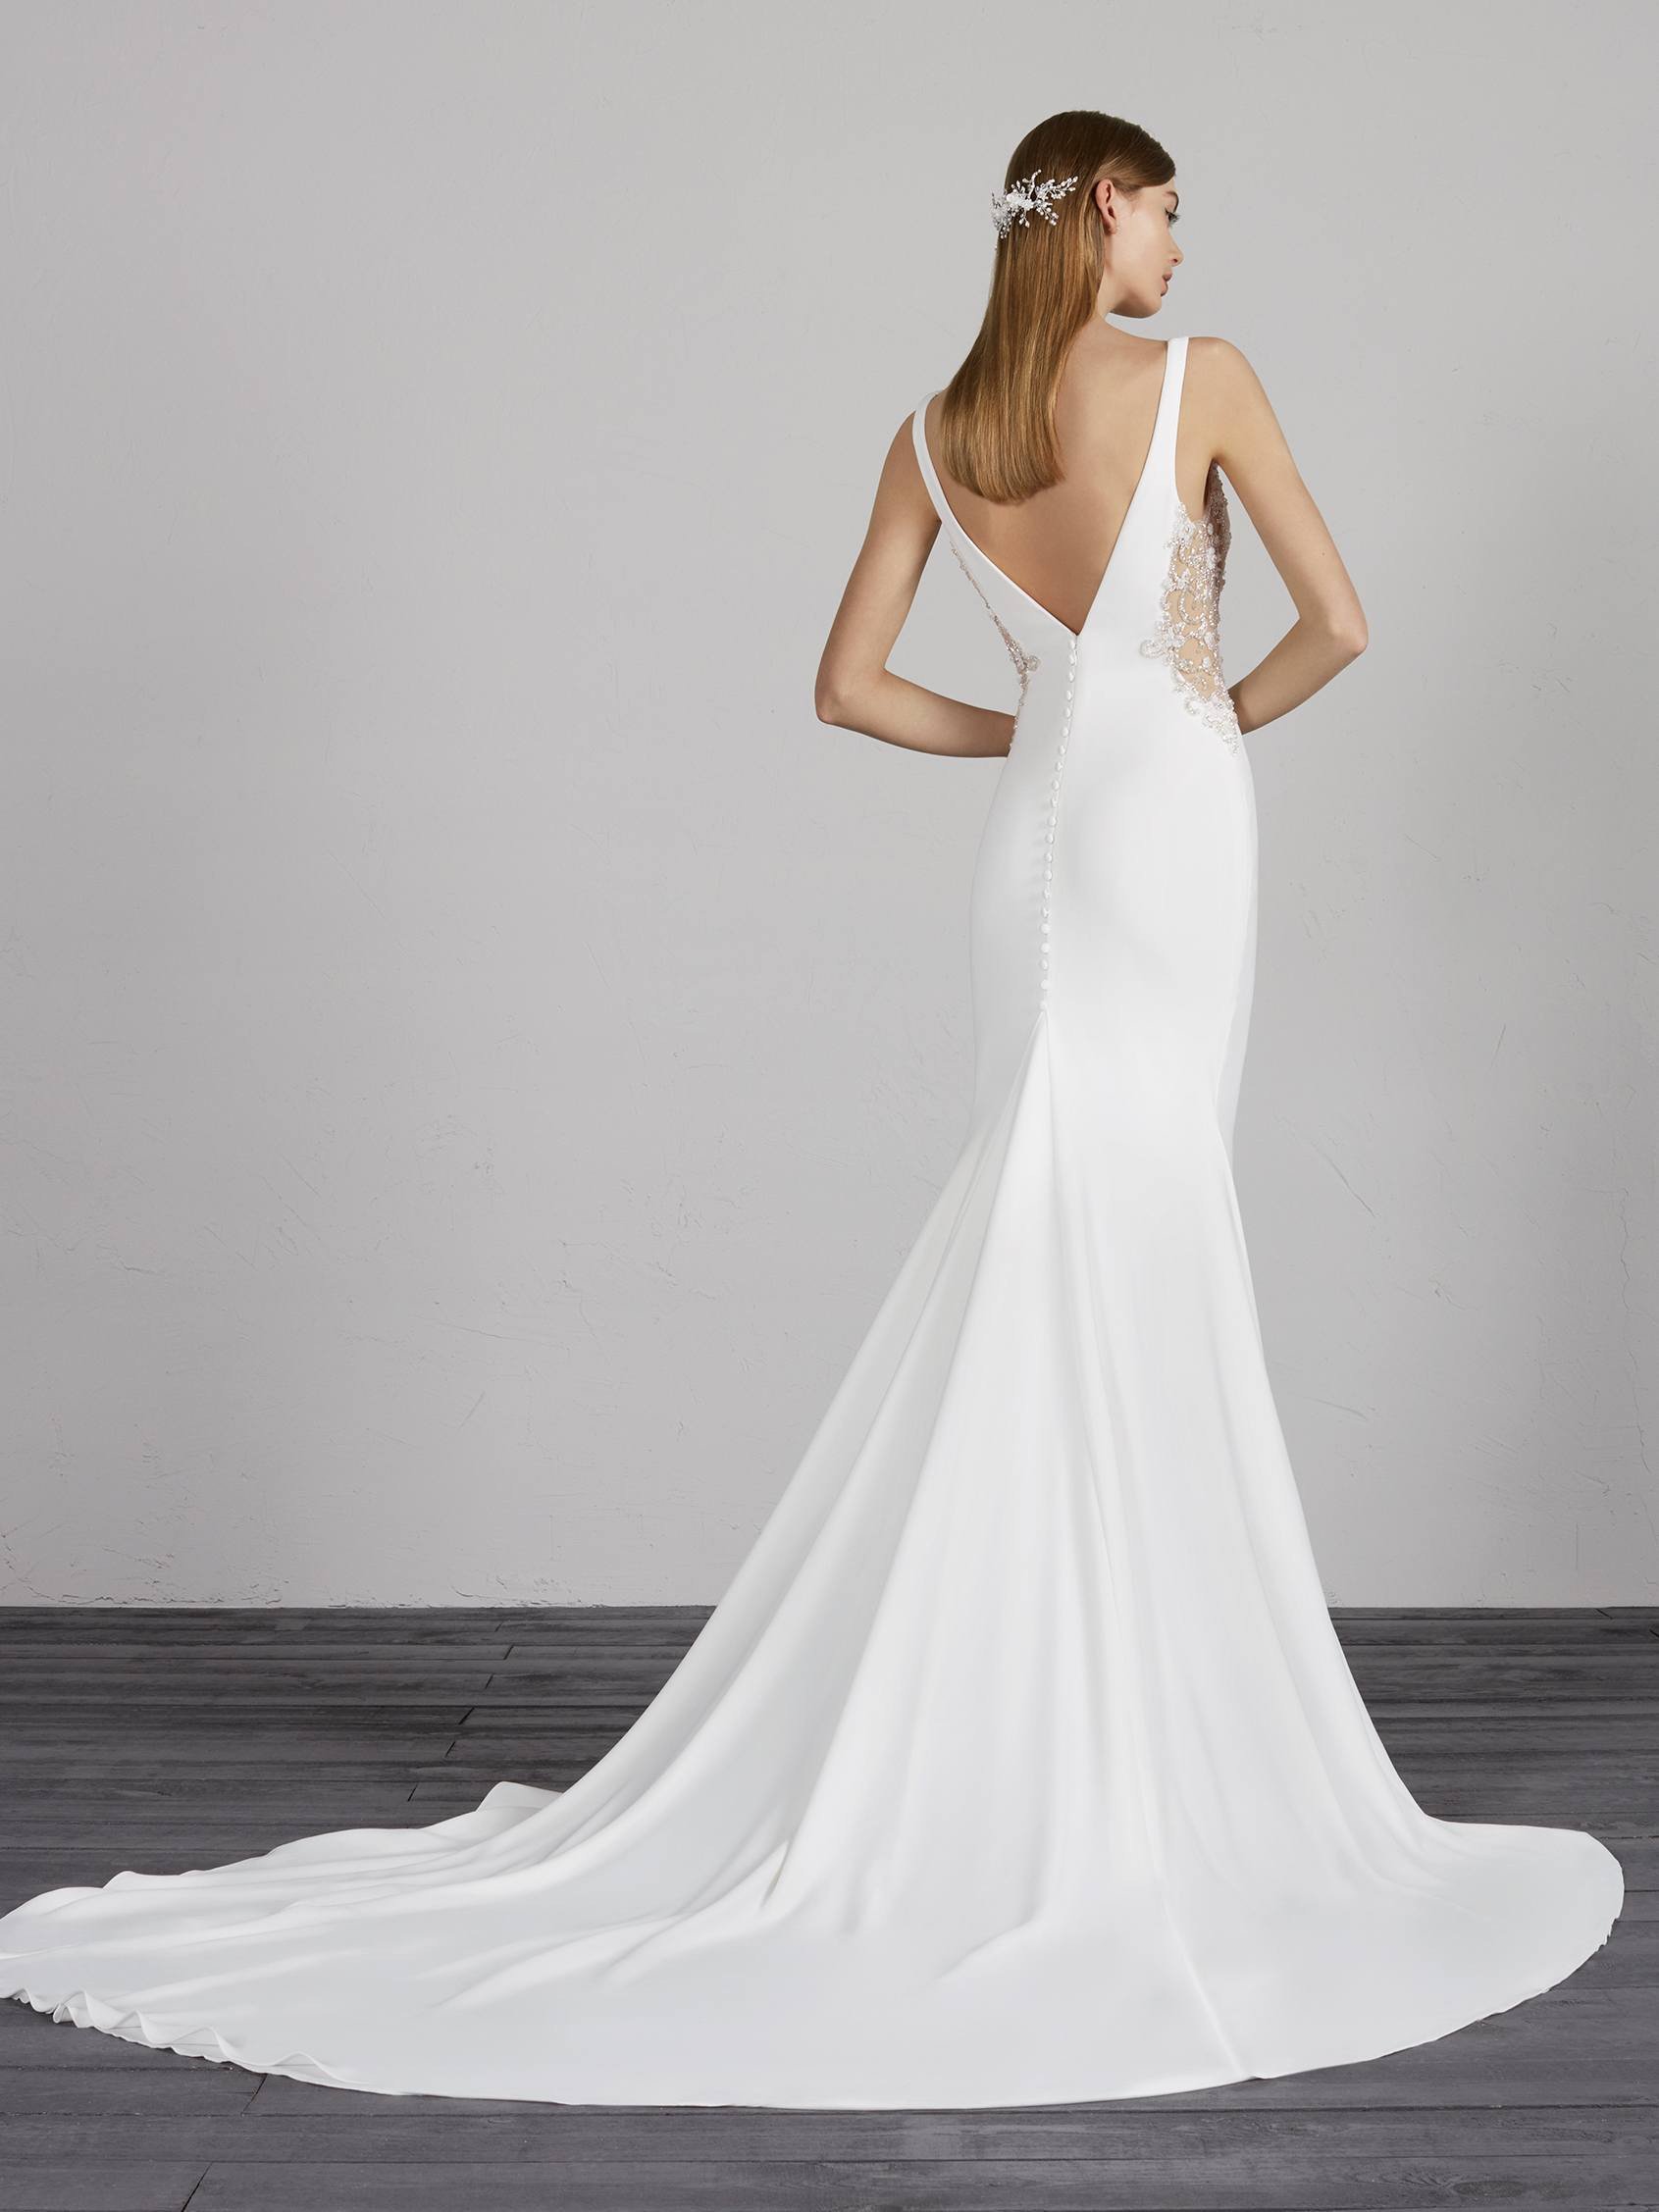 Try it on at Ellie's Bridal Boutique (Alexandria, VA) – Pronovias MAXIME